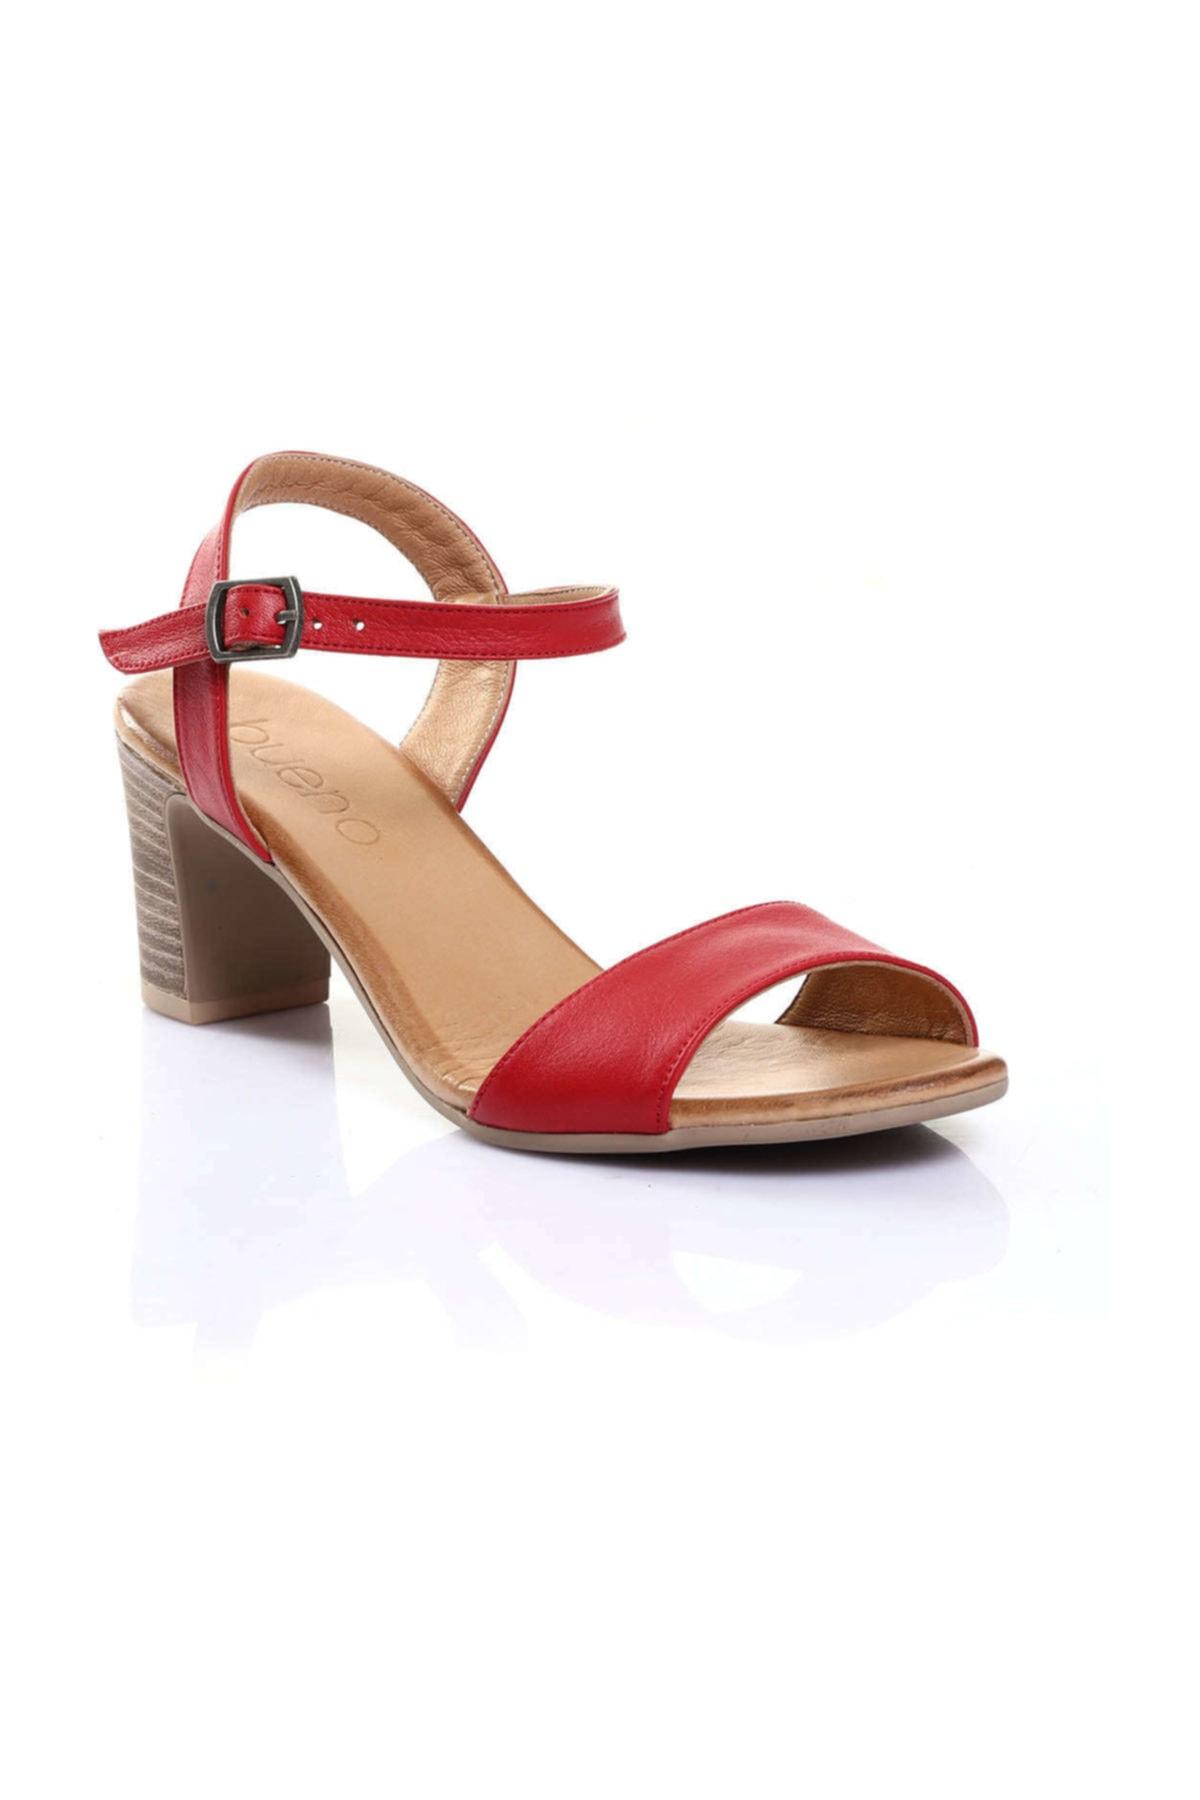 BUENO Shoes Siyah Kadın Sandalet 9n1506 2